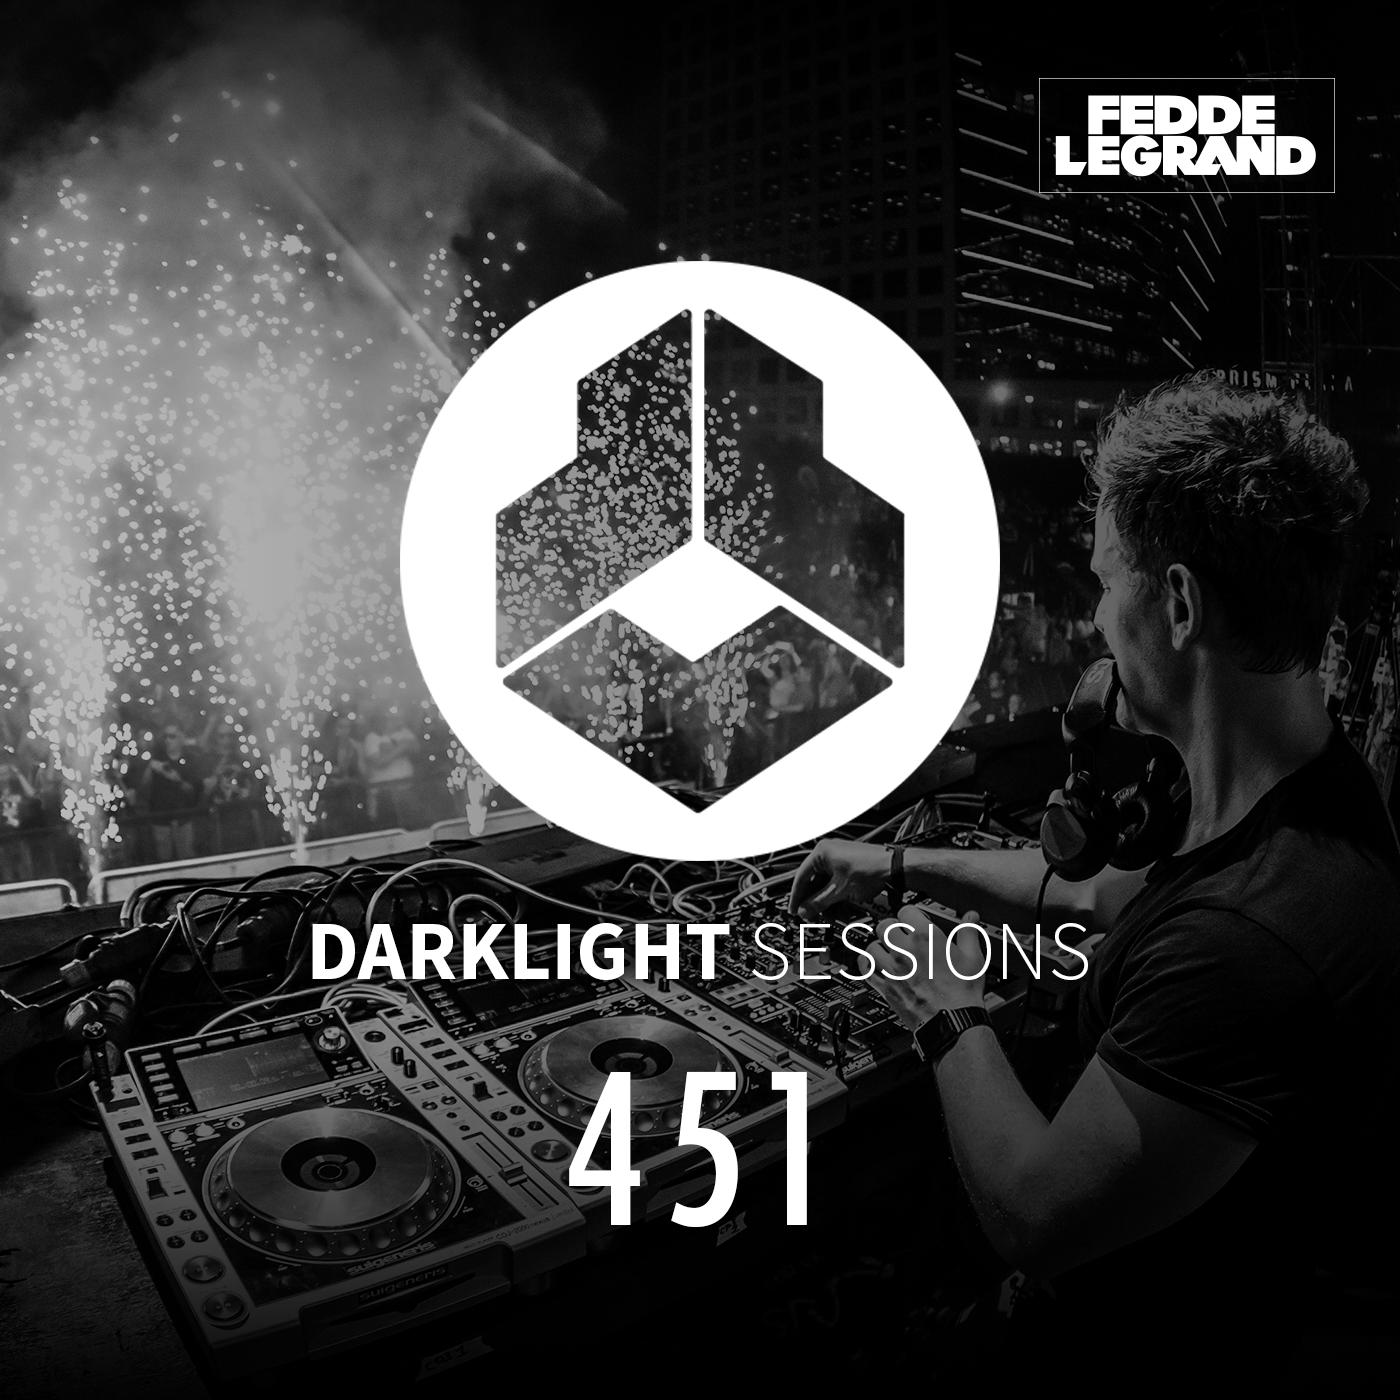 Darklight Sessions 451